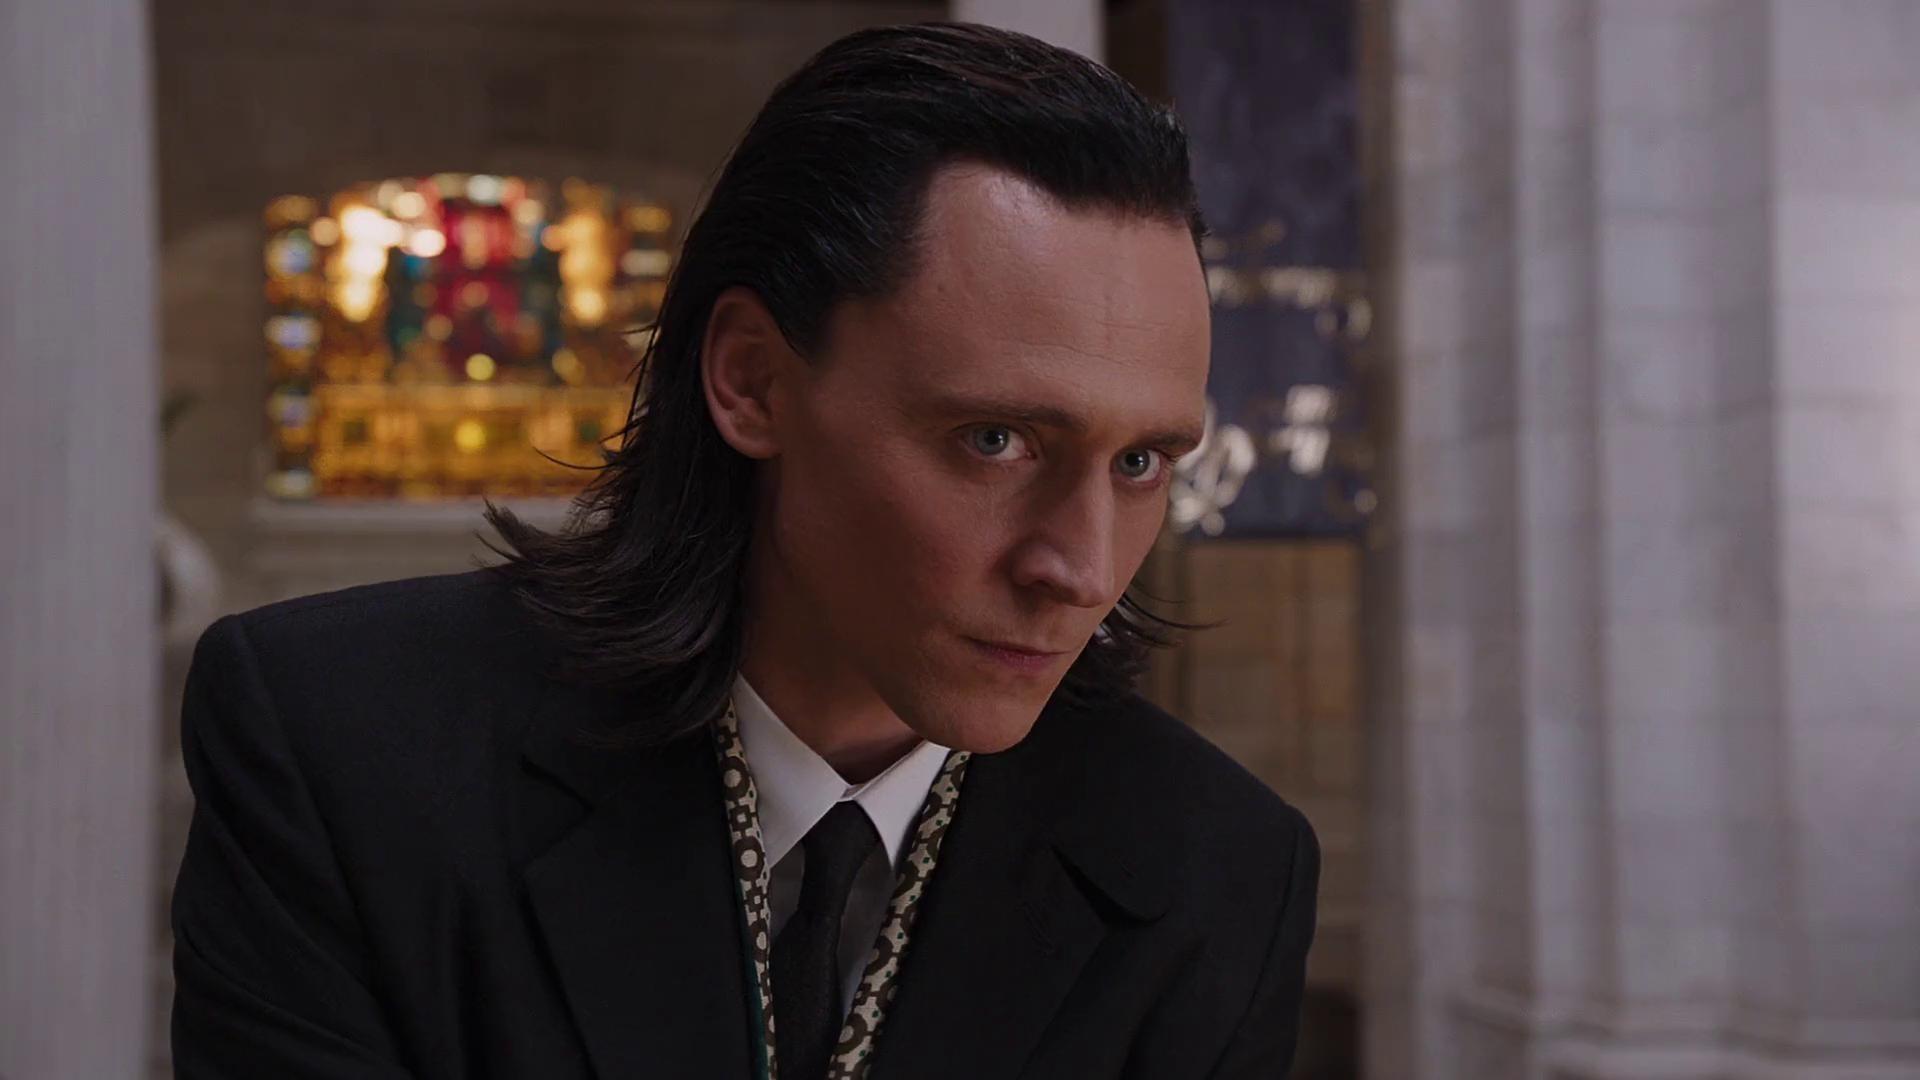 Loki tom hiddleston the avengers (movie) wallpaper